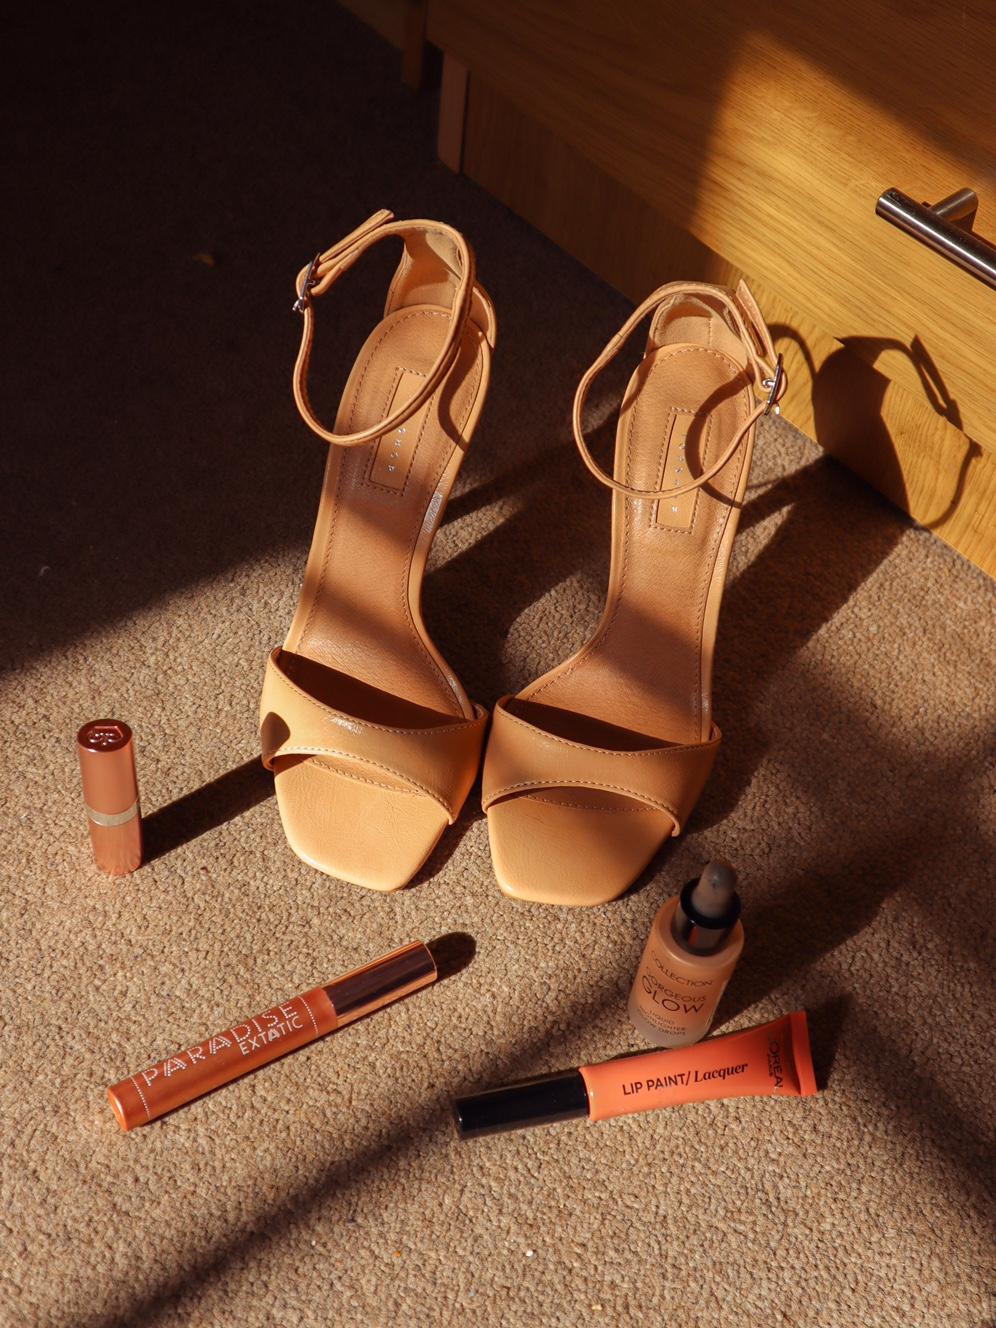 lovethesales nude sandals